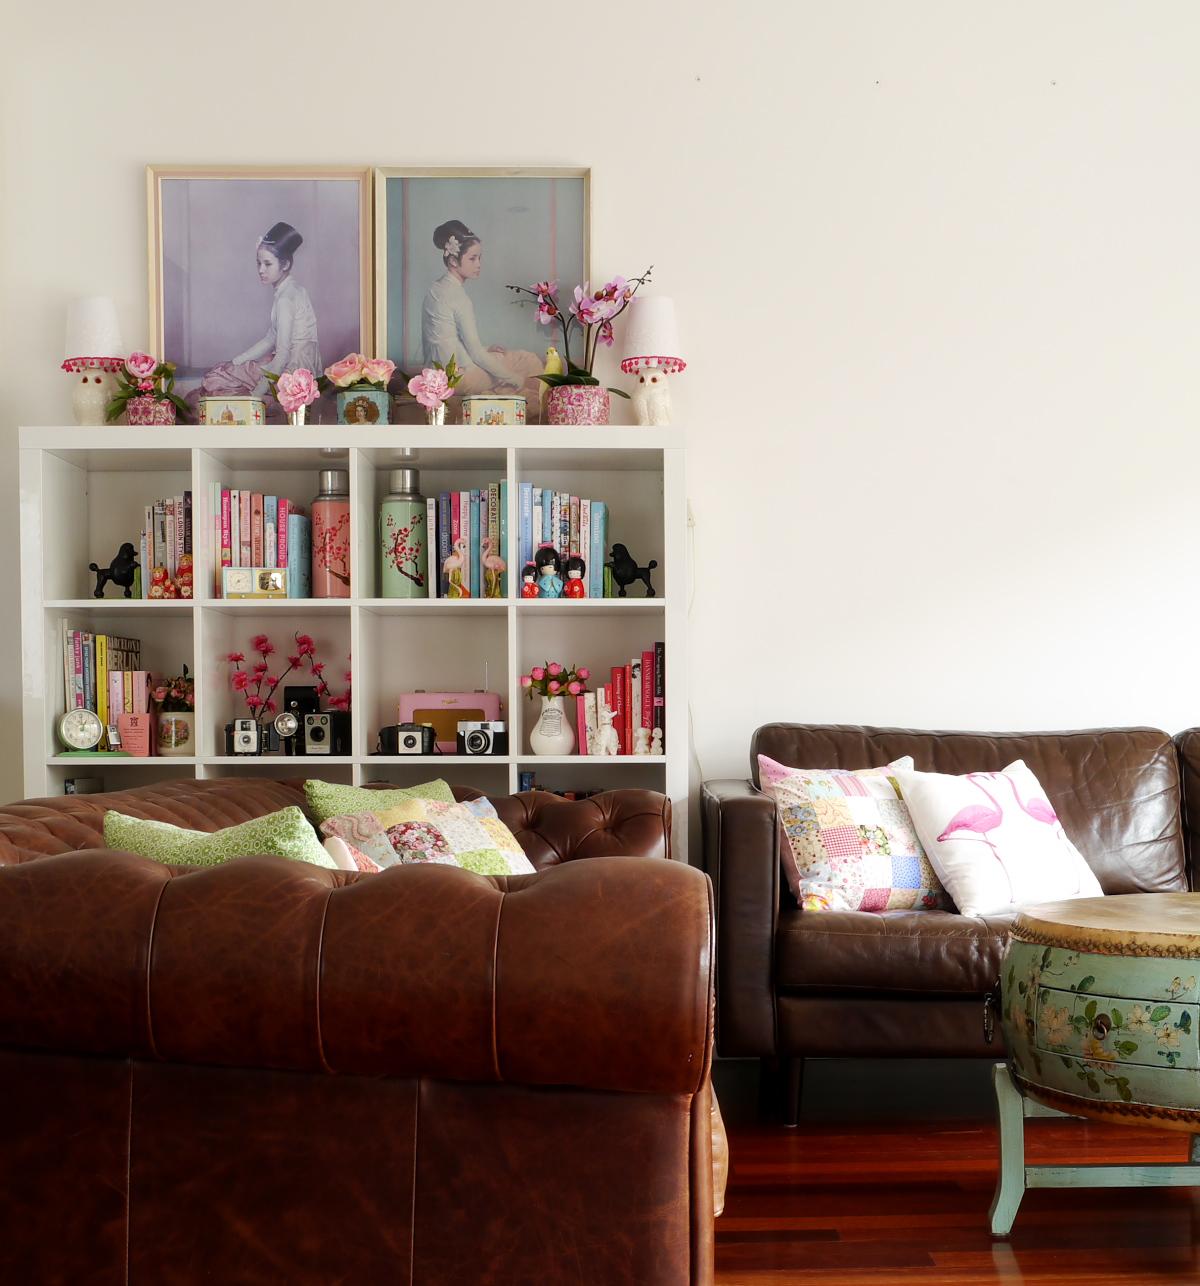 The Living Room Australia: Room 54 €� El's Living Room (Melbourne, Australia)